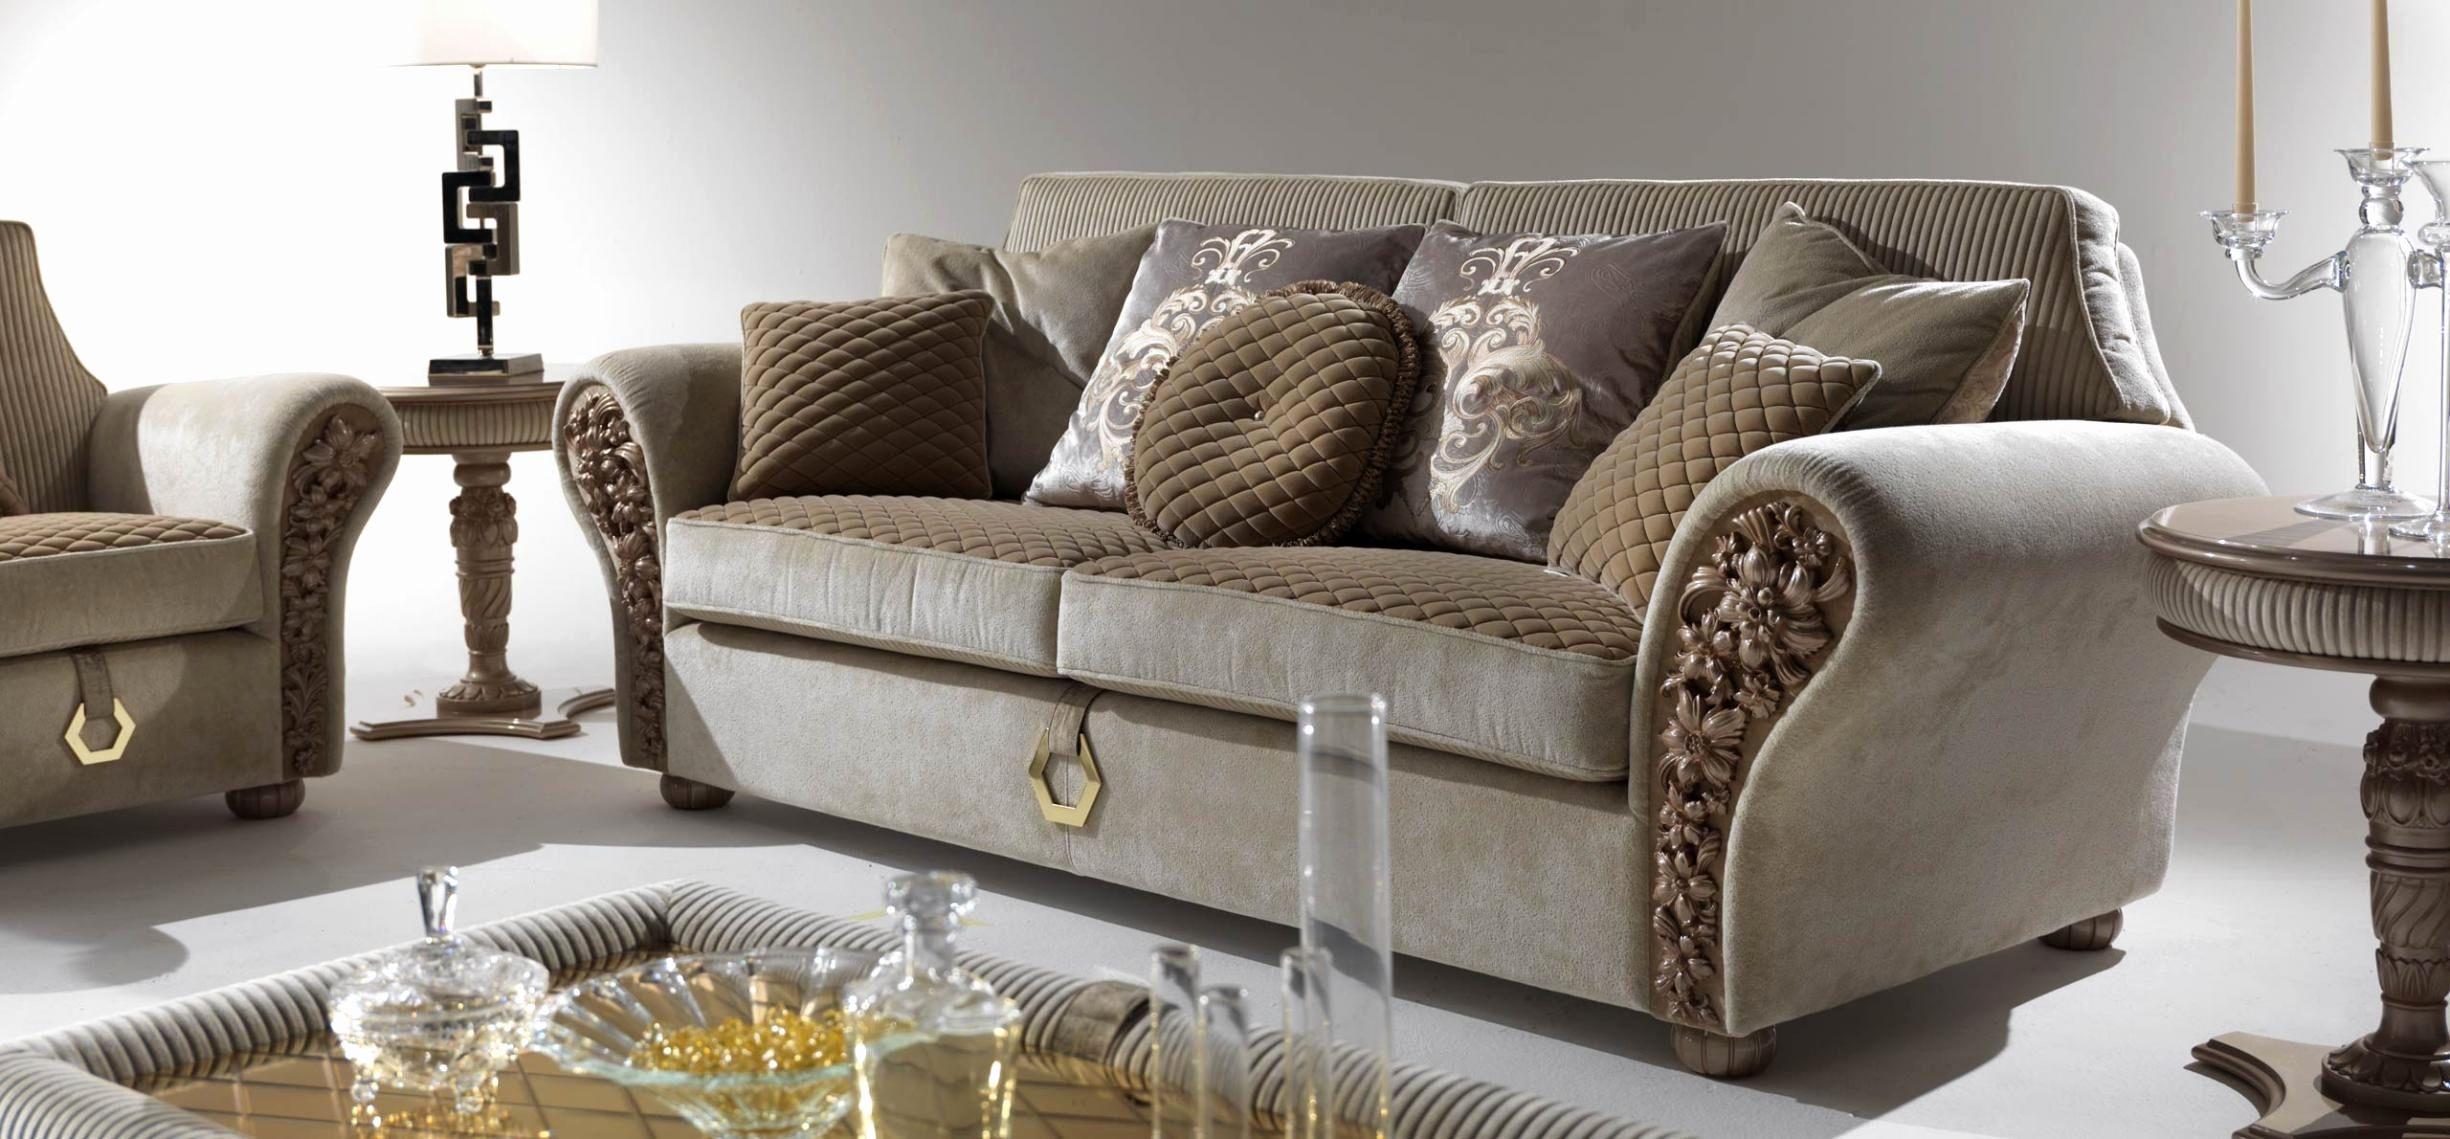 Tce Degreaser Aerosol Brownells   Sofa set, Classic sofa ...